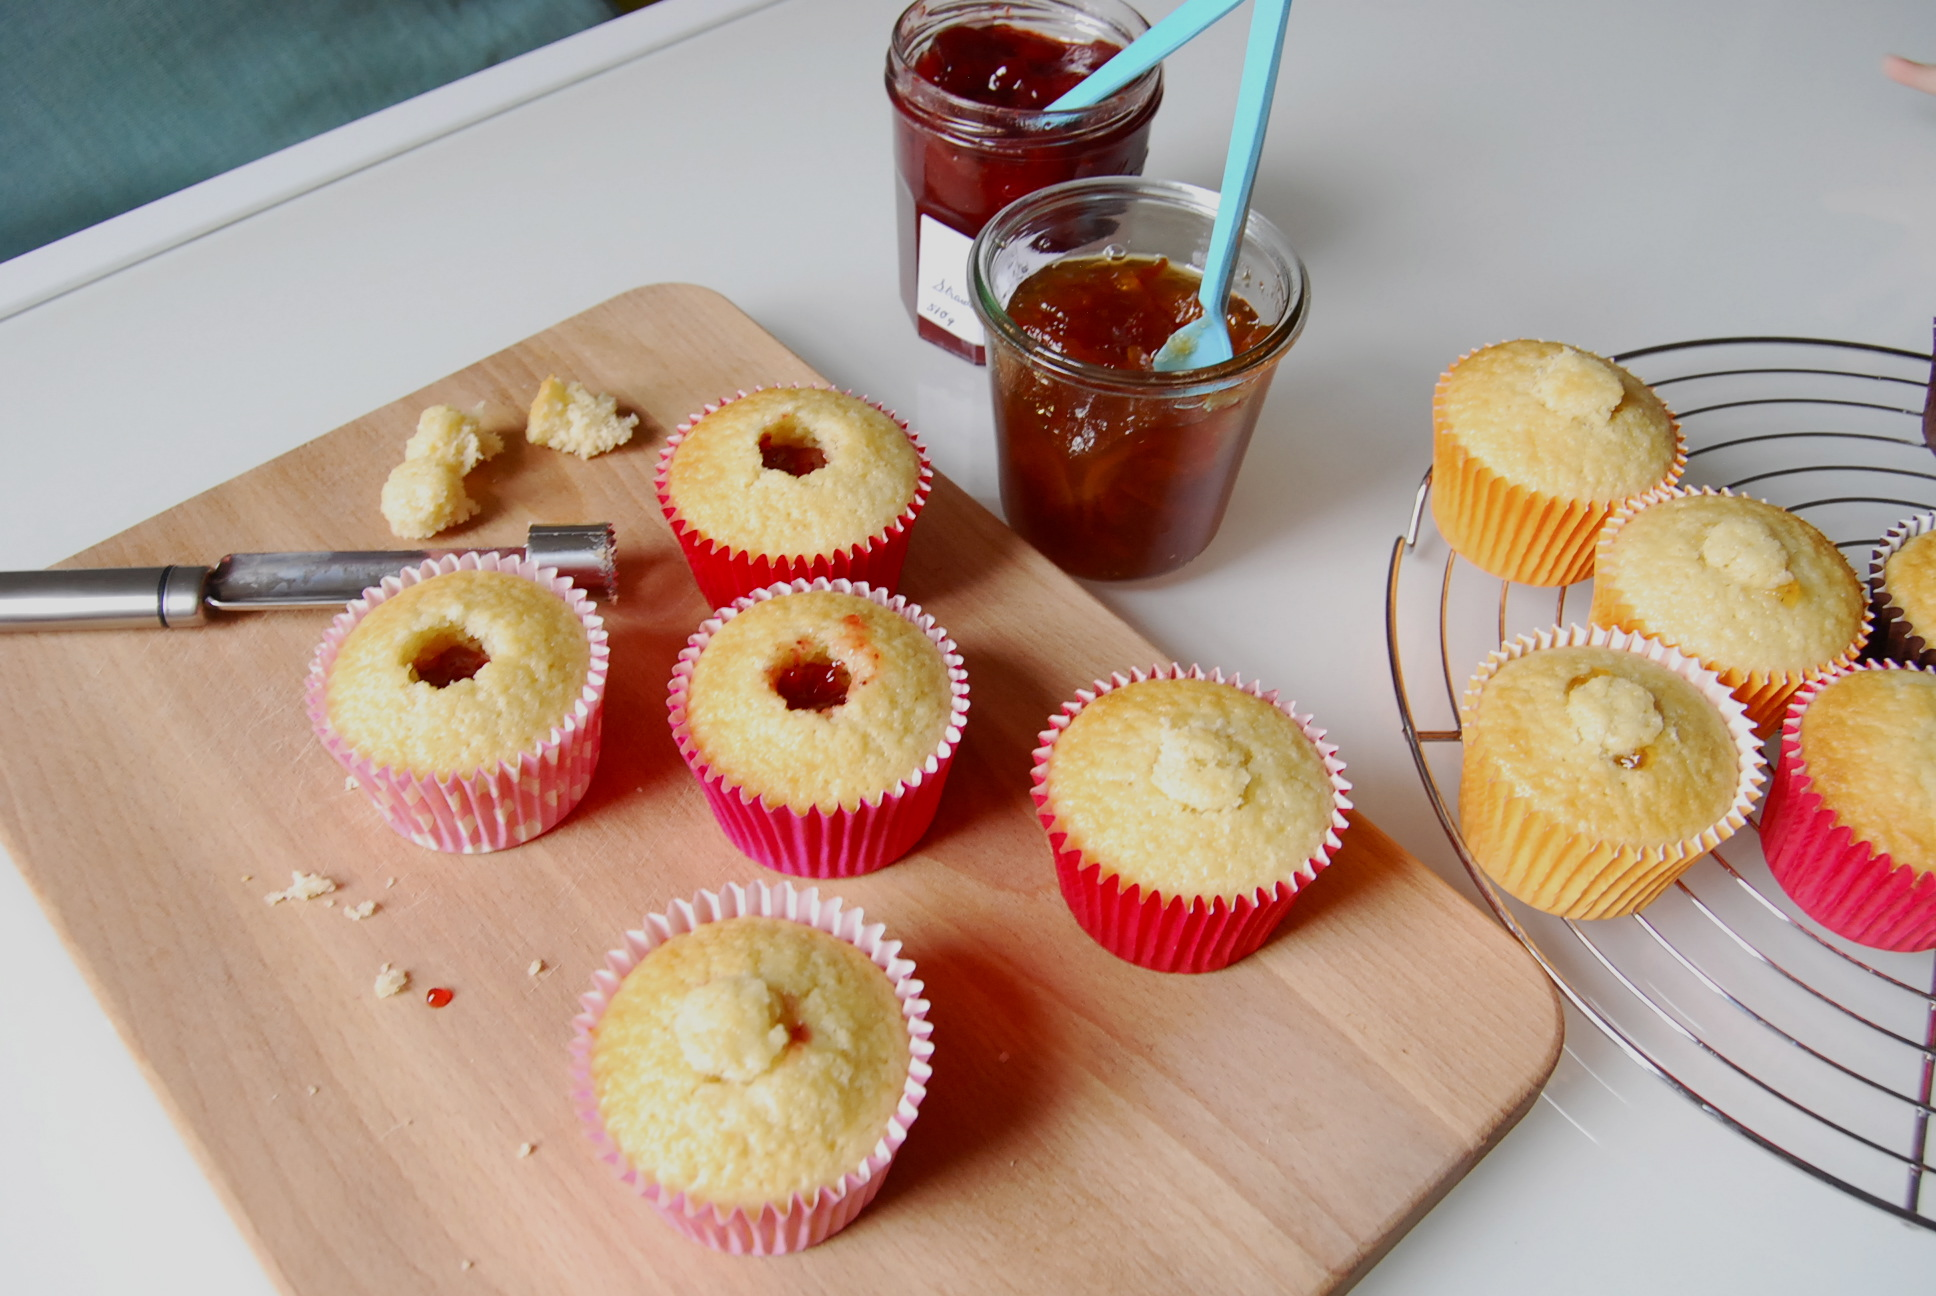 Cupcake Heaven Jaffa Cake And Jammy Dodgers Style